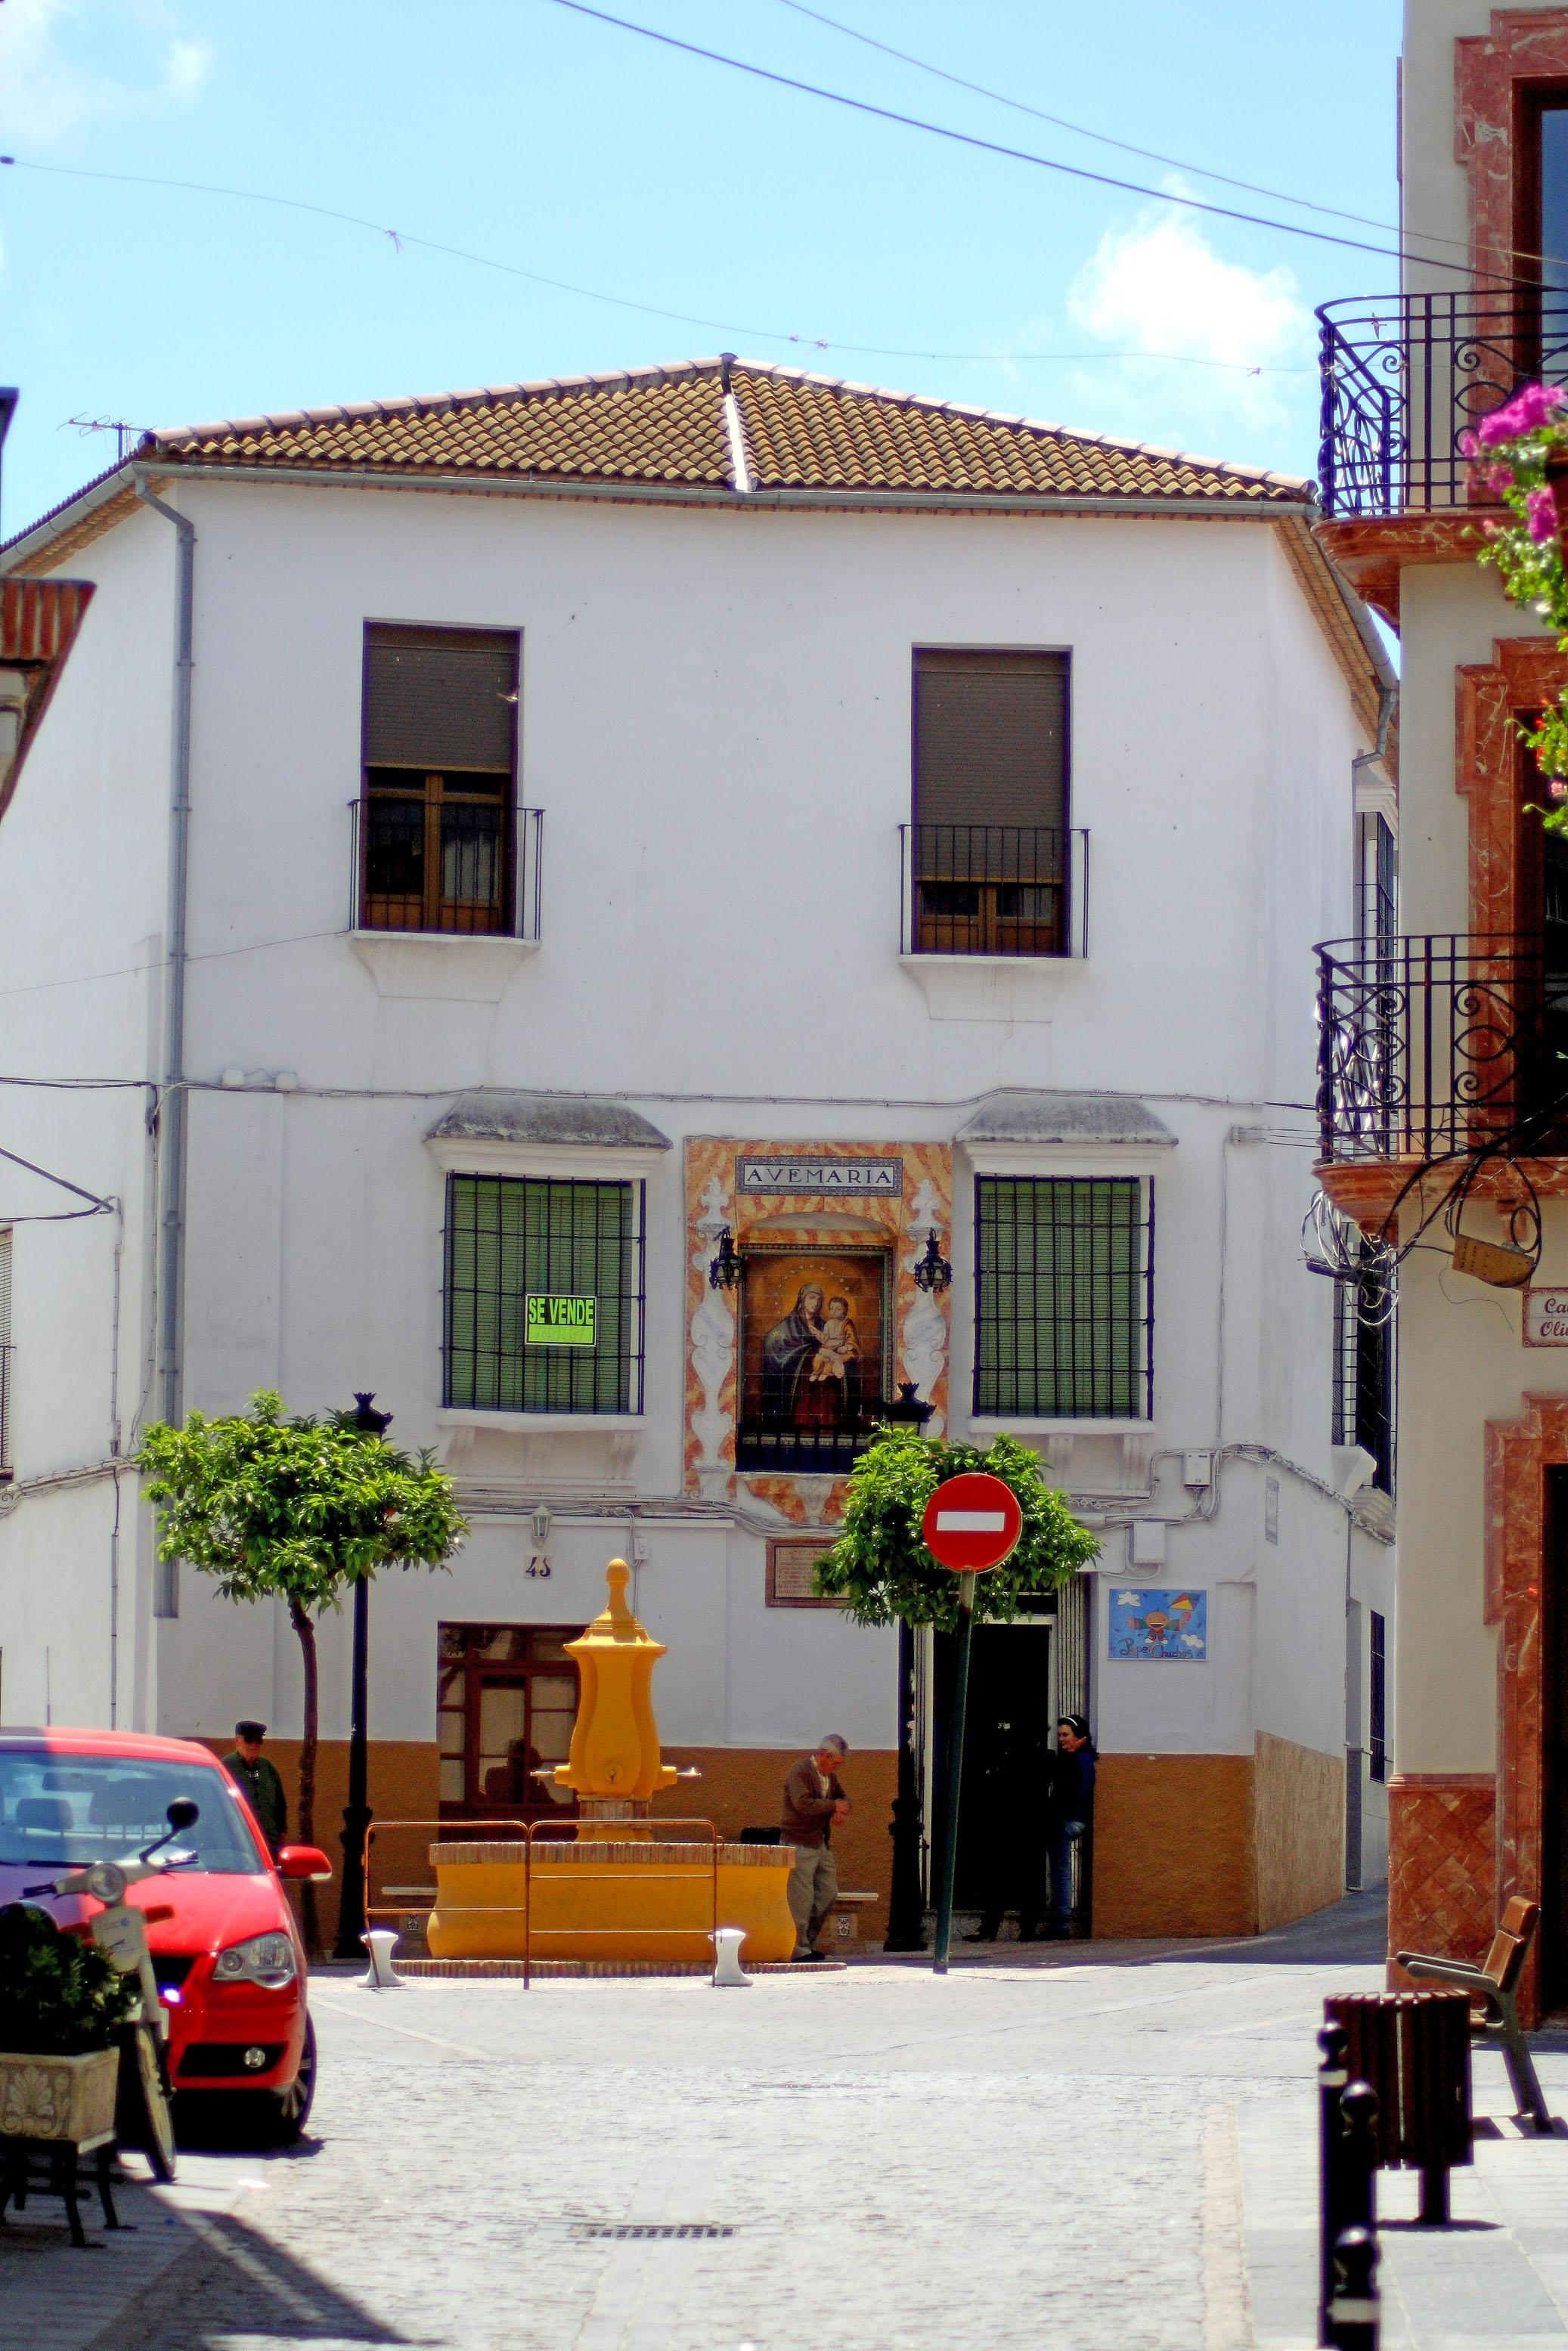 Plazuela Alta